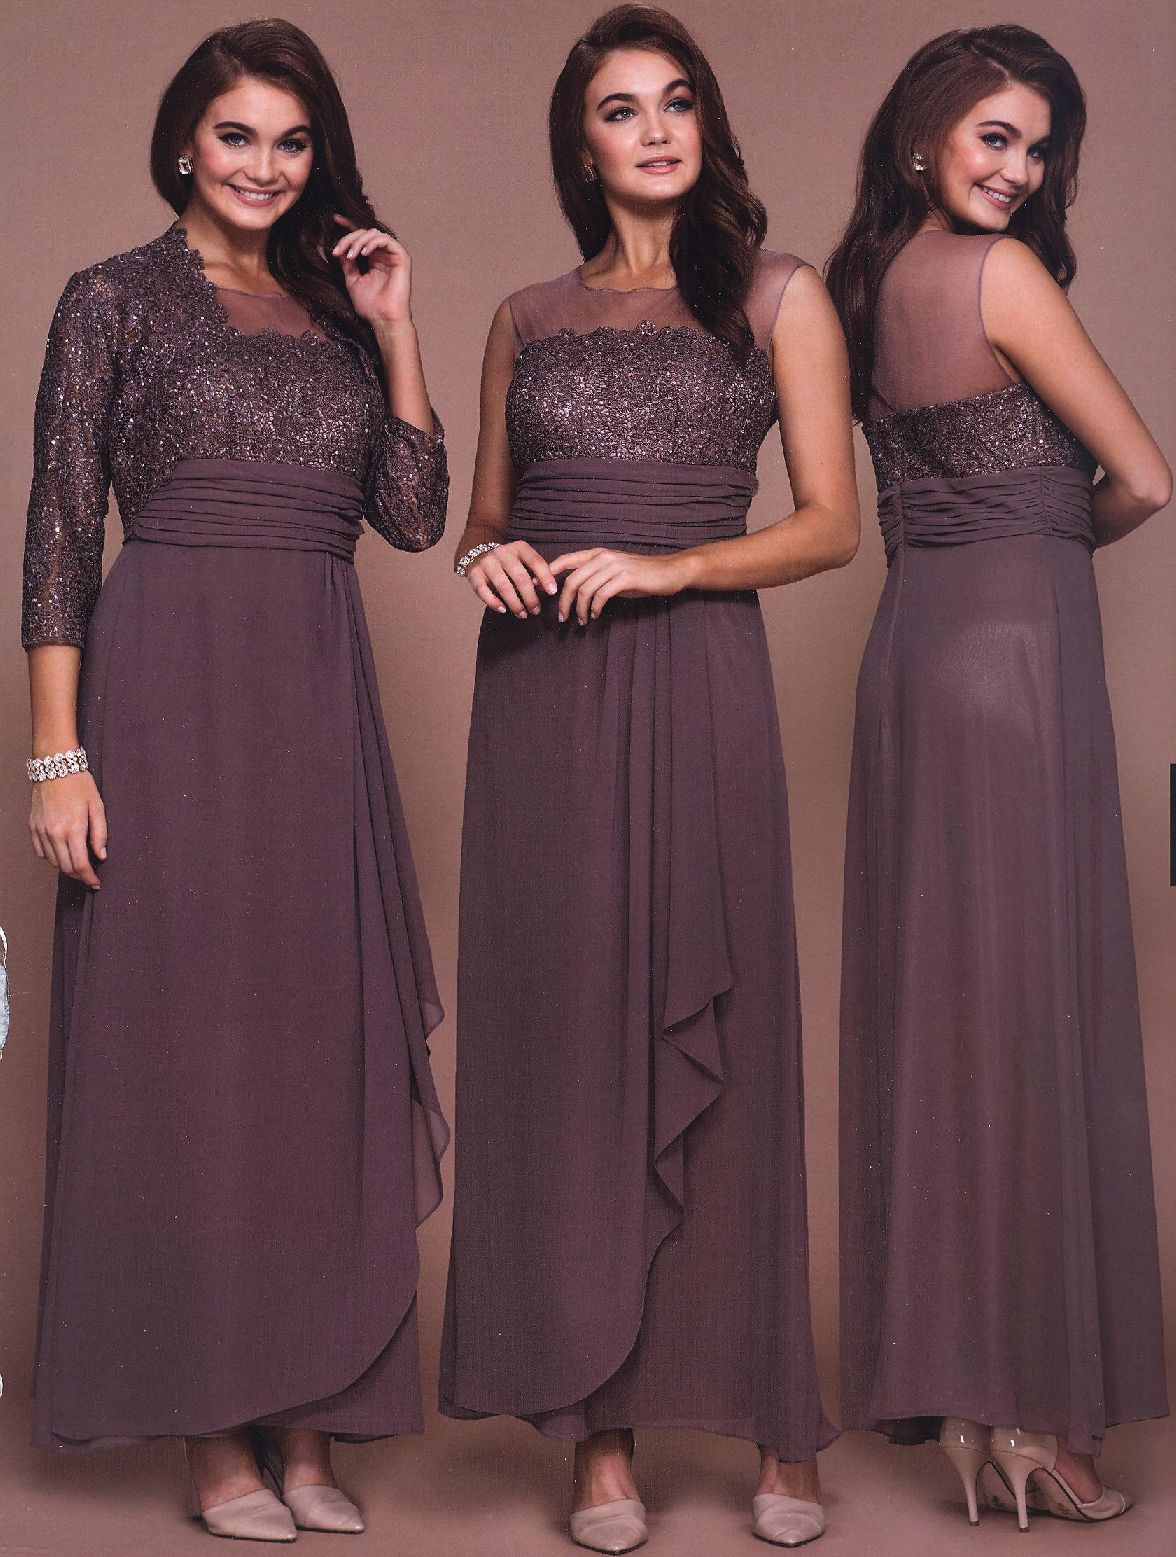 Wedding dresses under $200  Evening Dresses Mother of Bride Dresses UNDER  by ANABELucBR